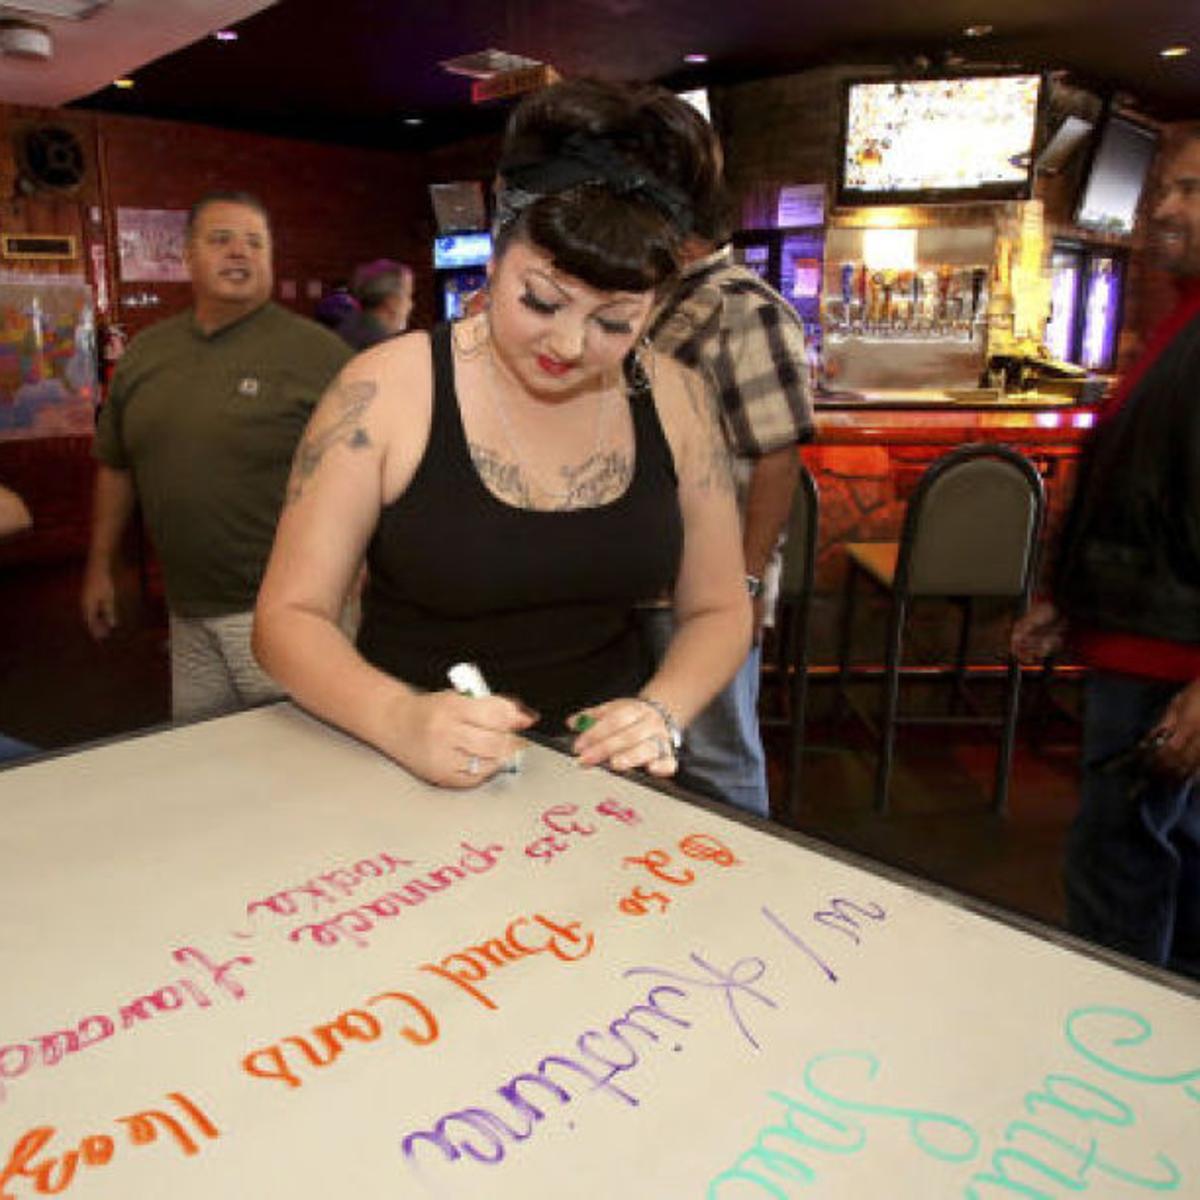 Tucsons Wooden Nickel Turns 30 Neighborhood Bar To Mark Milestone